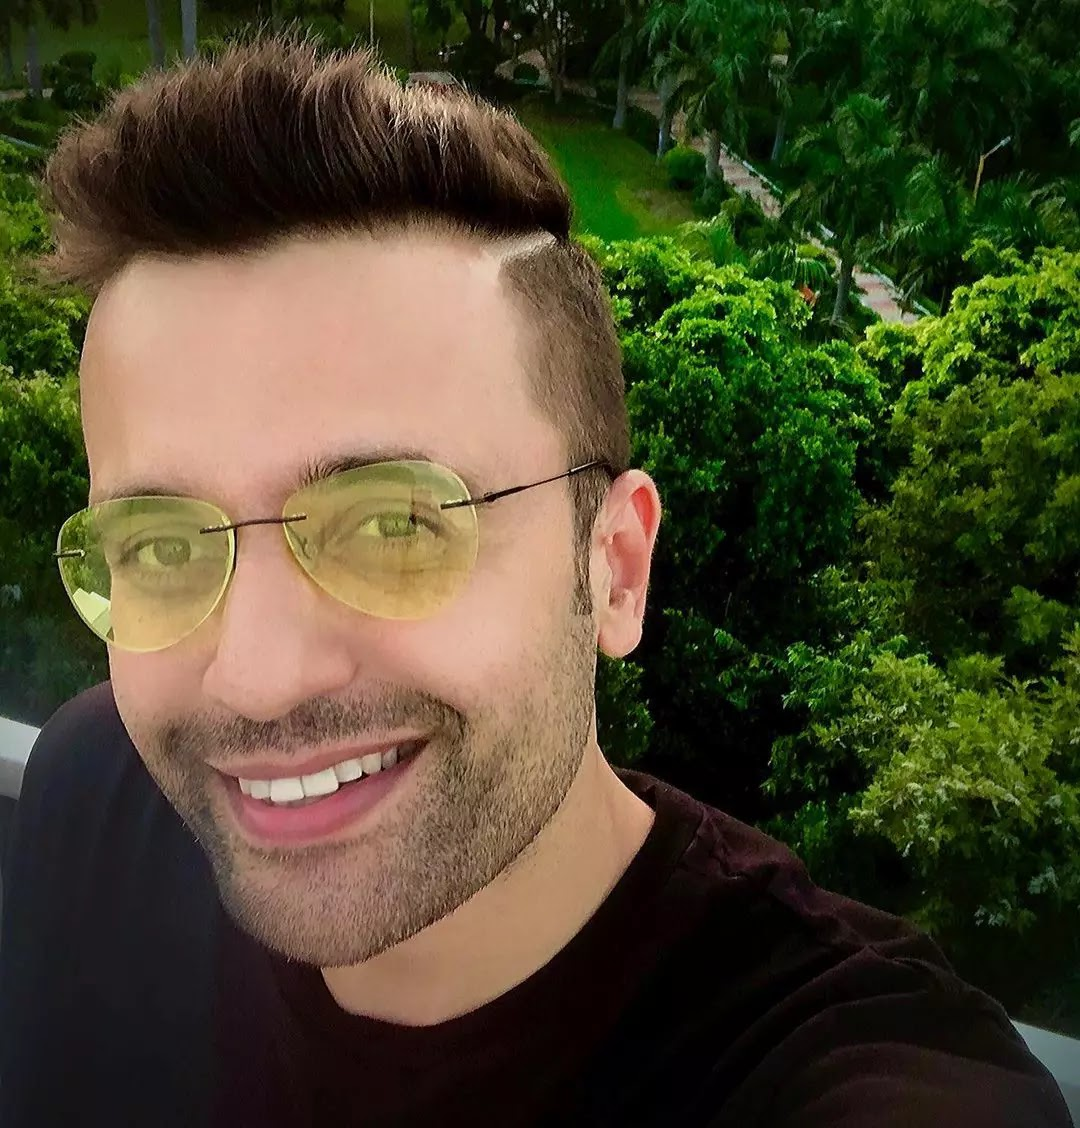 Sandeep Maheshwari selfie pic